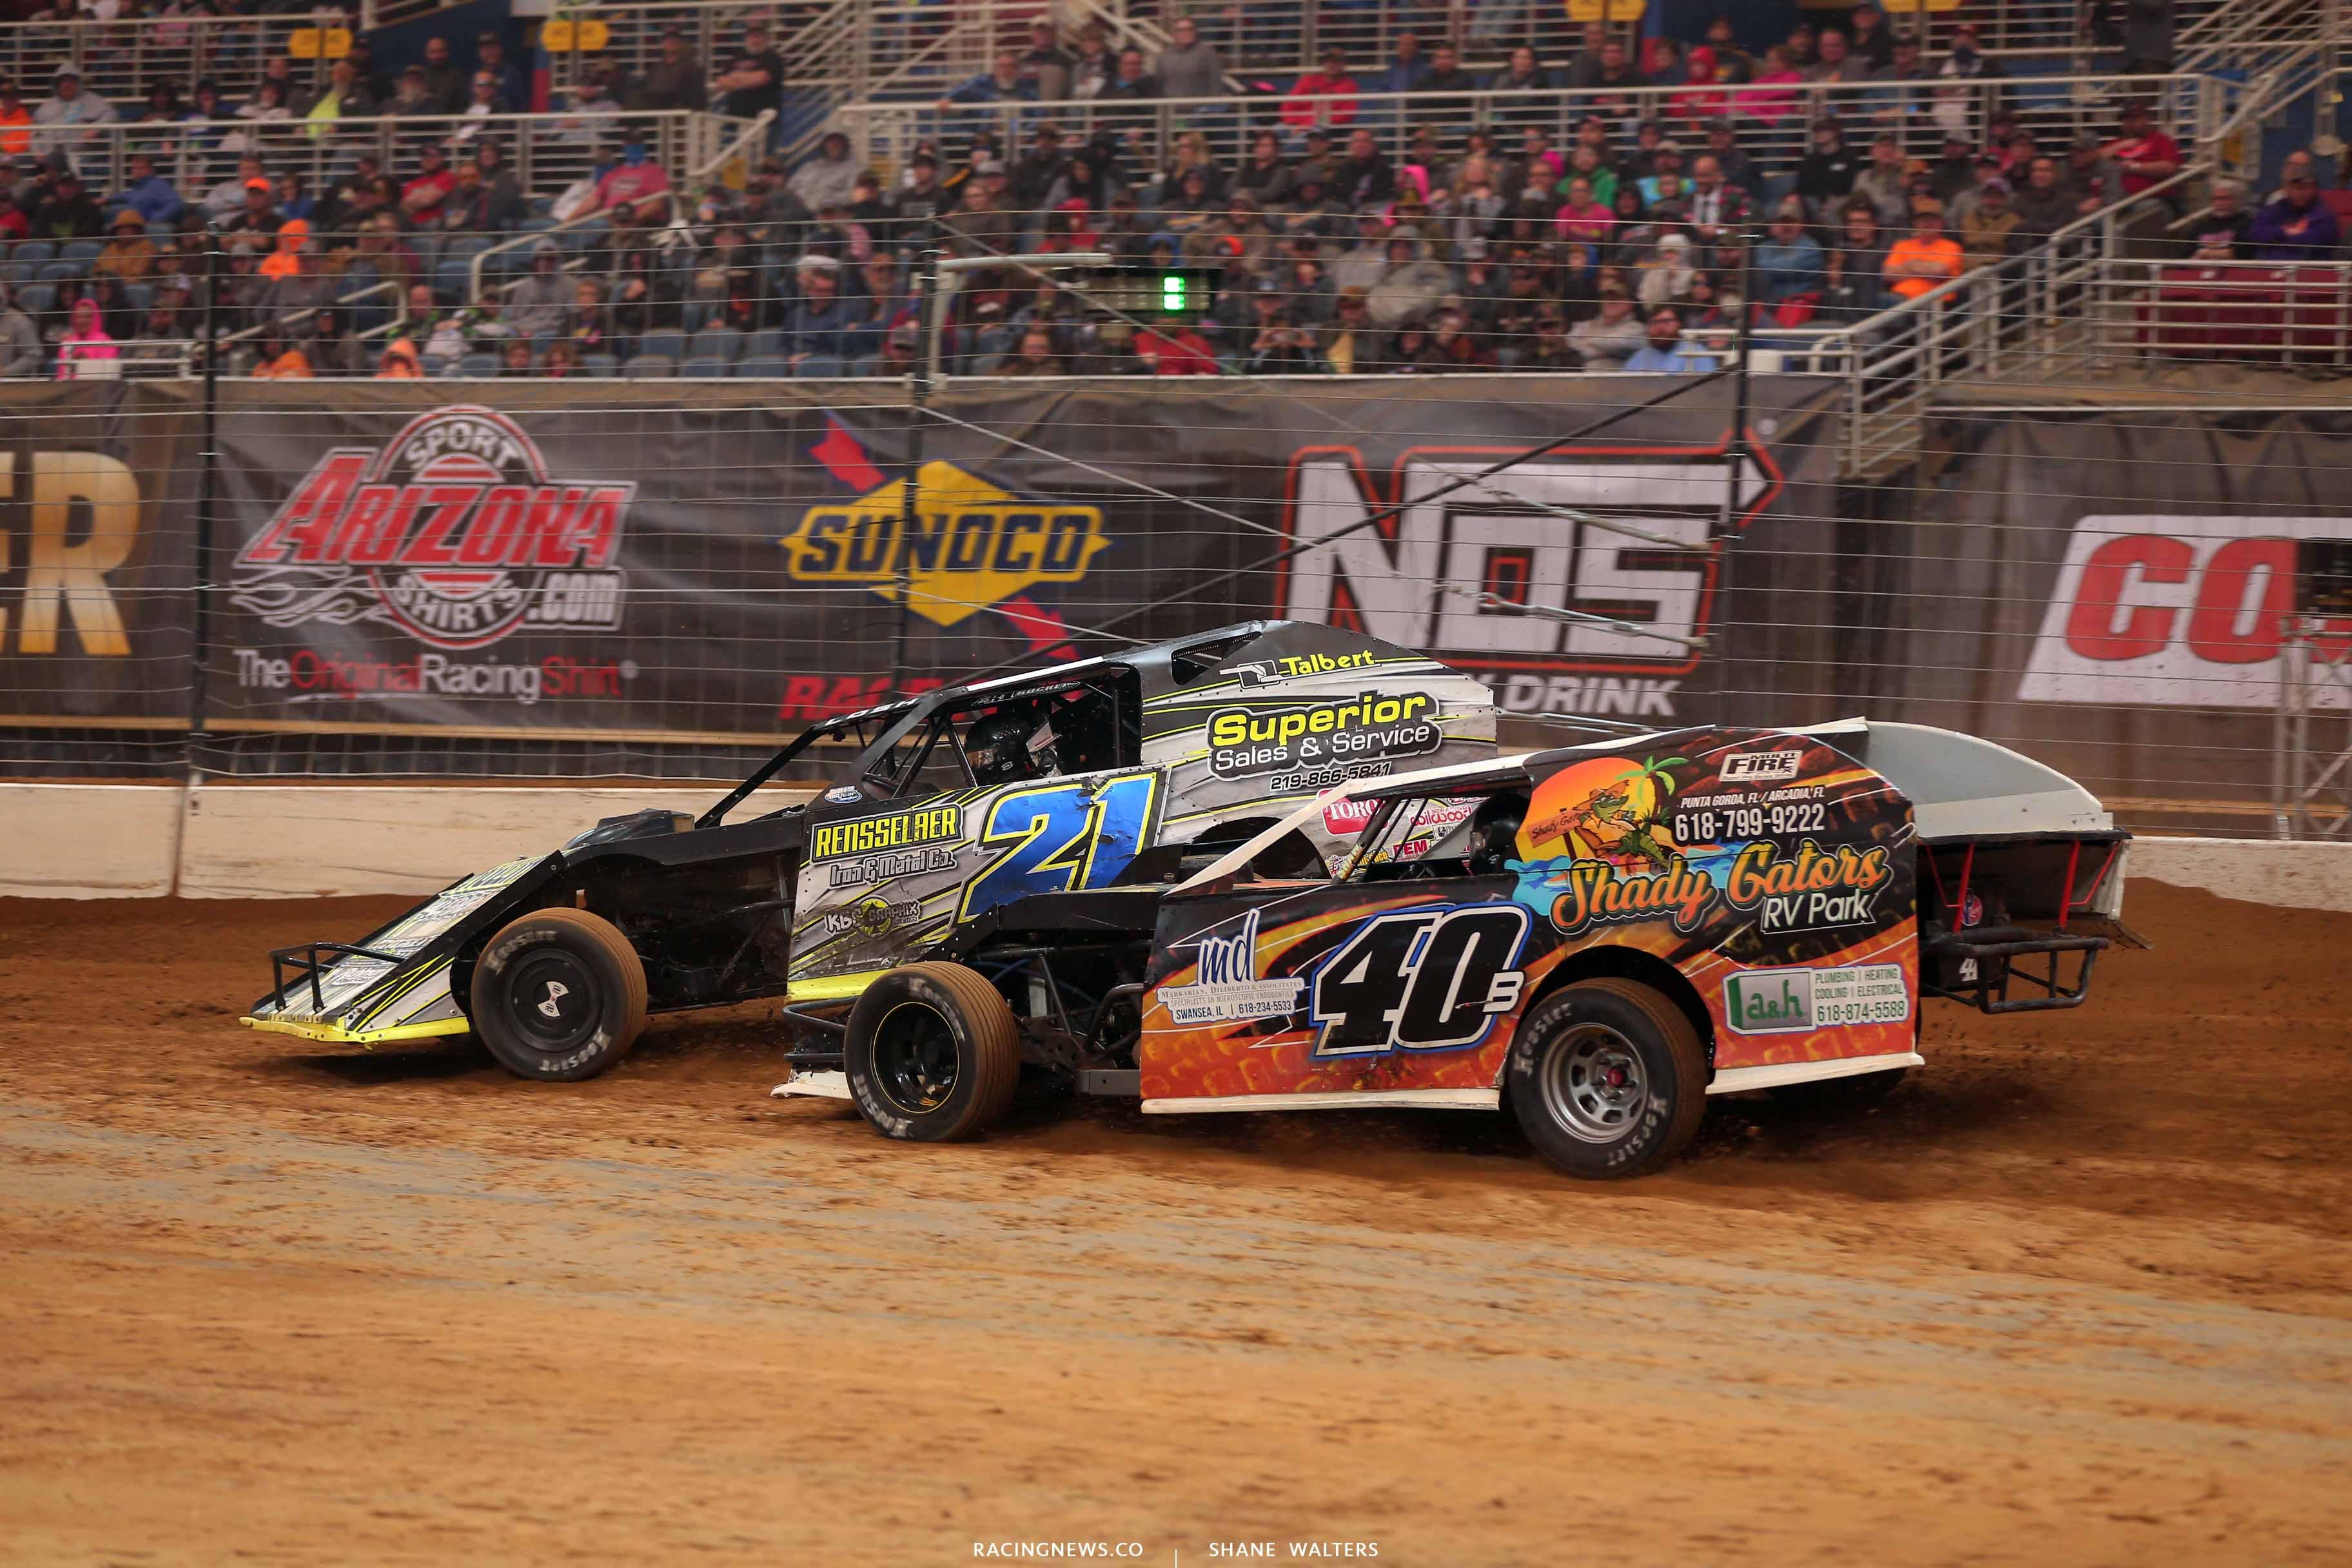 Derek Losh and Kyle Bronson in the Gateway Dirt Nationals - Dirt Modifieds 2899